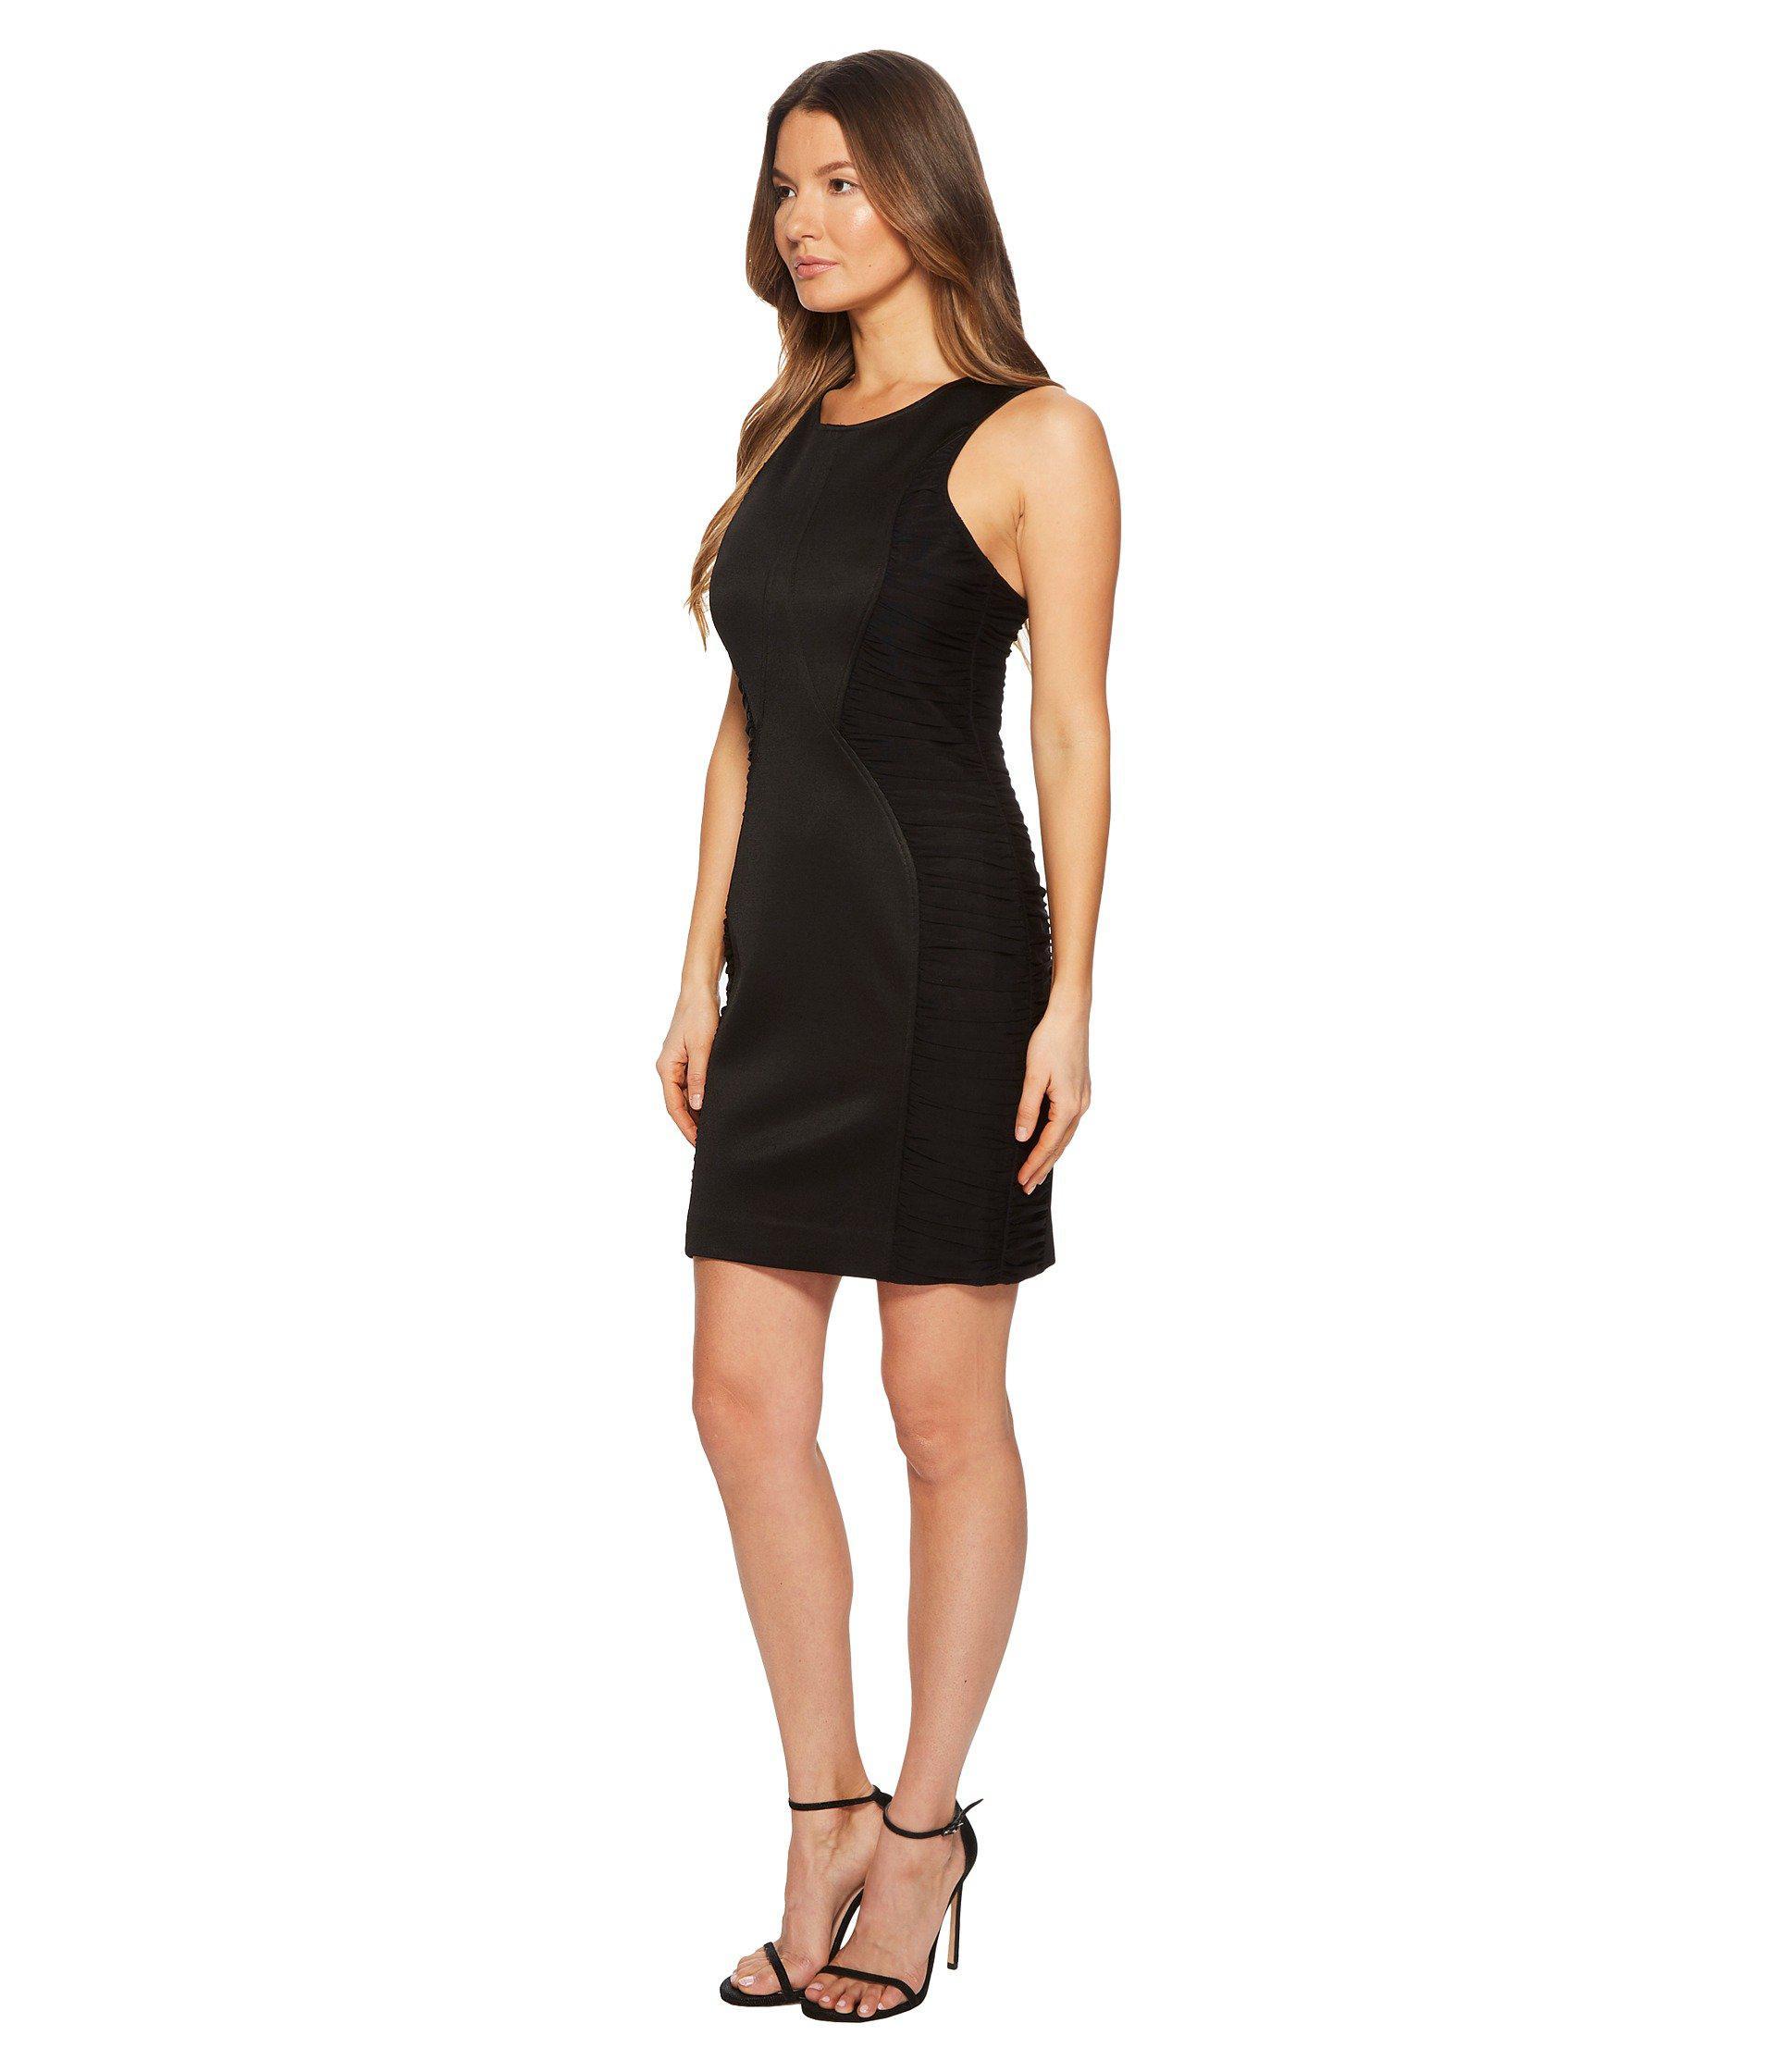 5c4265897433 Lyst - Versace Abito Donna Jersey Sleeveless Sheath Dress in Black - Save  55%